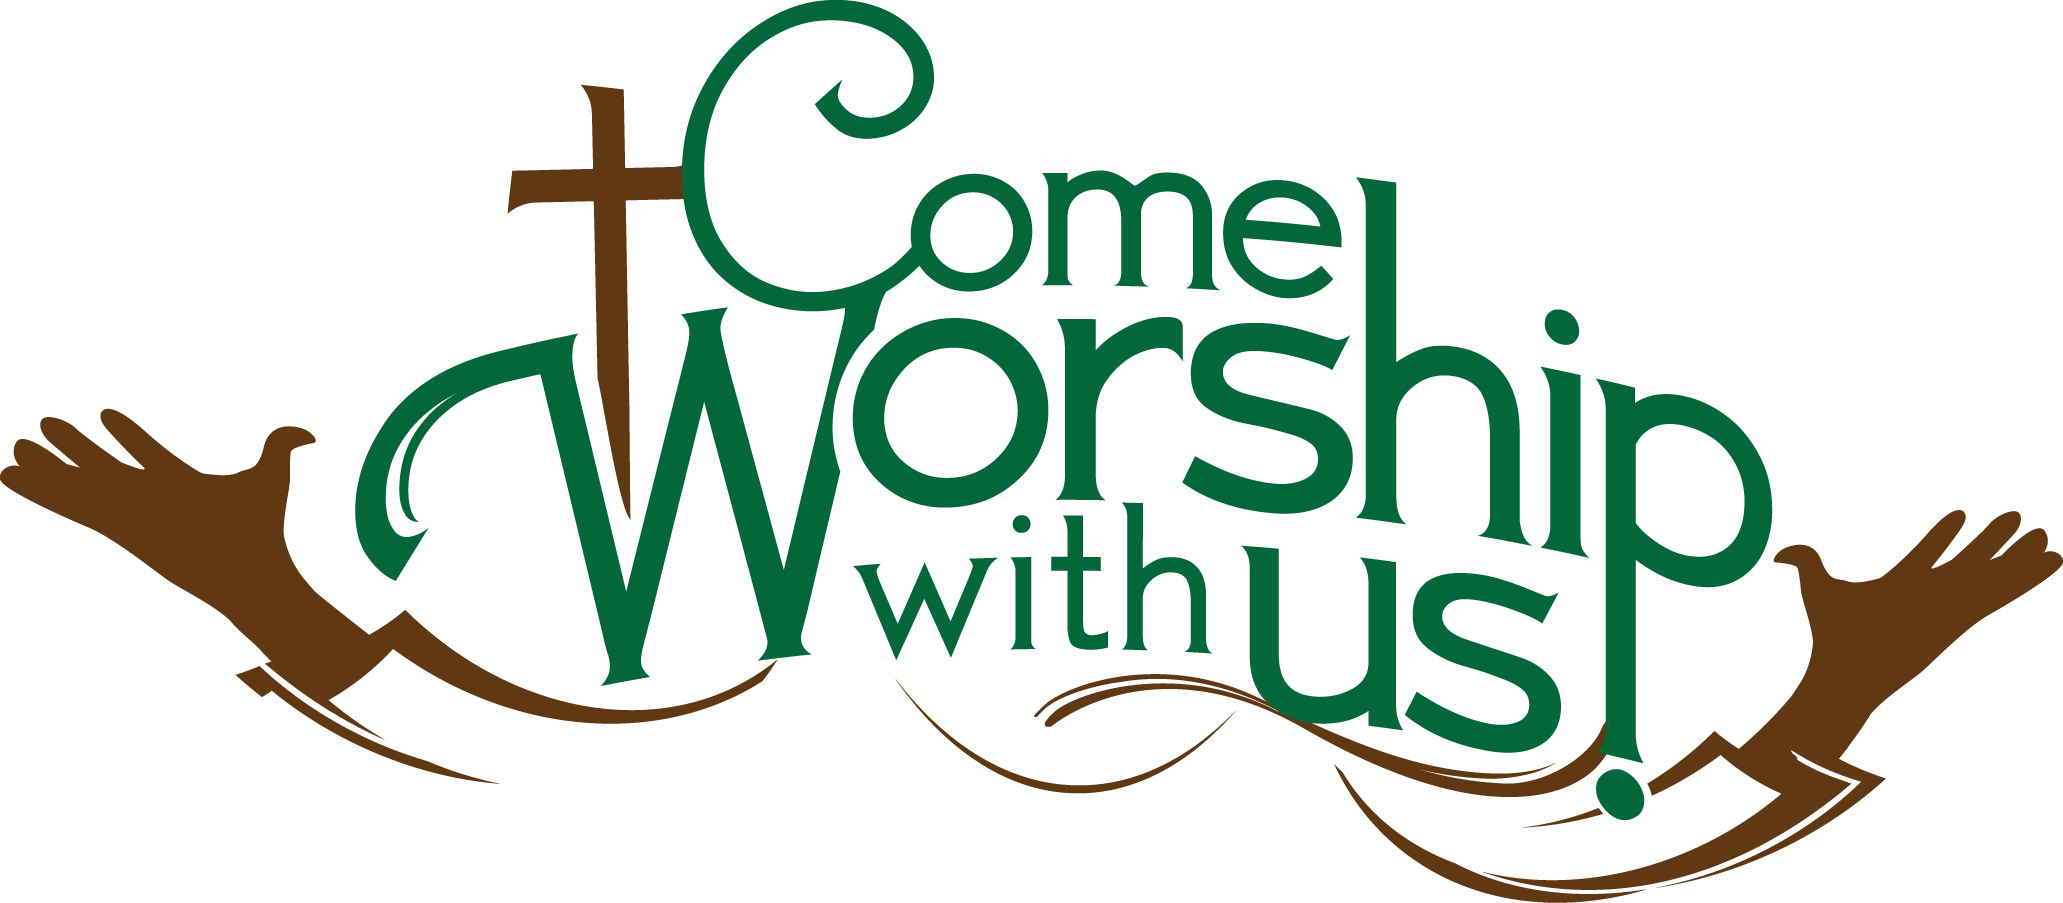 Come_Worship_w_Us.jpg